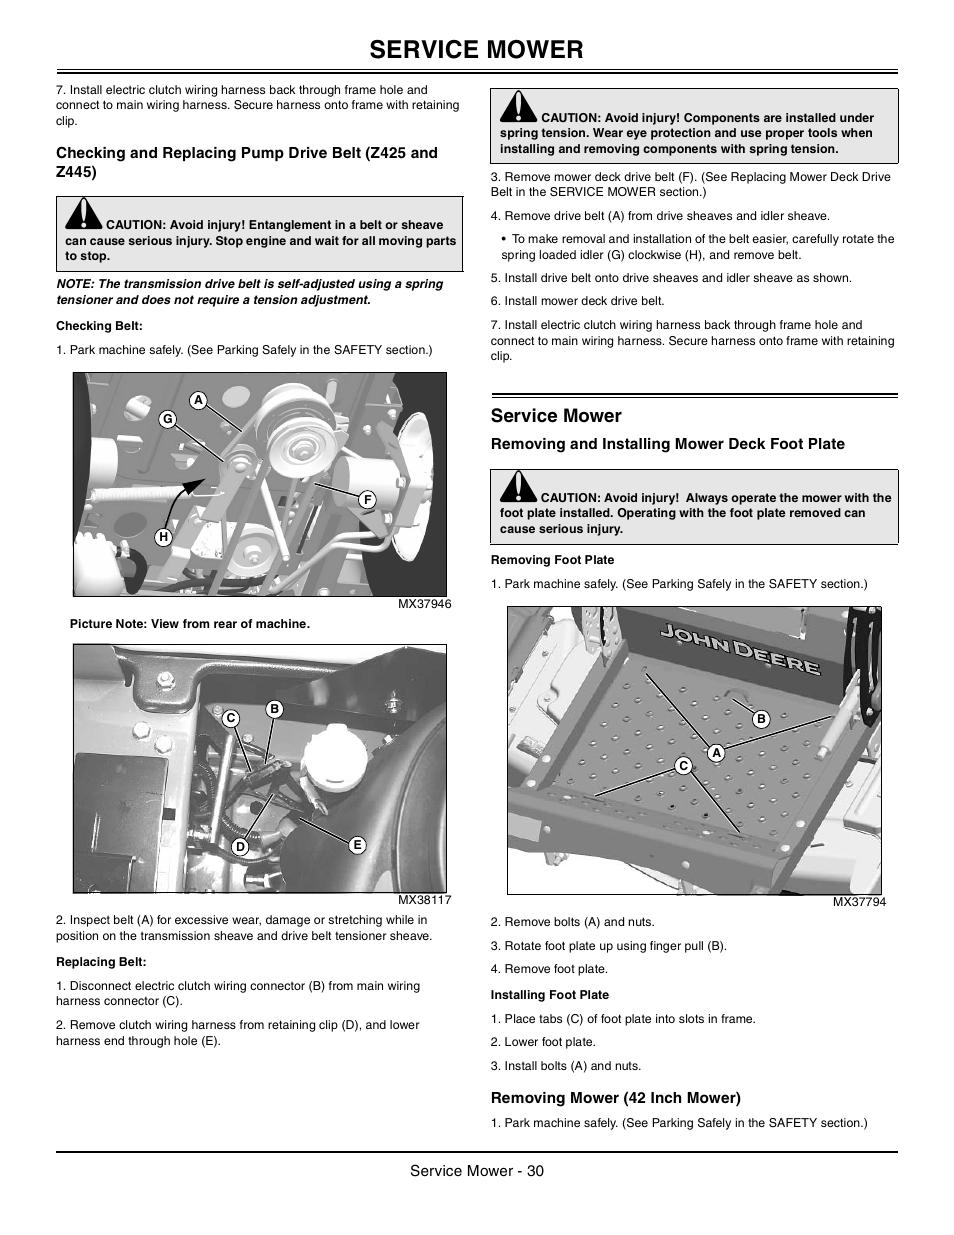 John Deere X324 Wiring Diagram Z445 X300 Harness Schematic Rx75